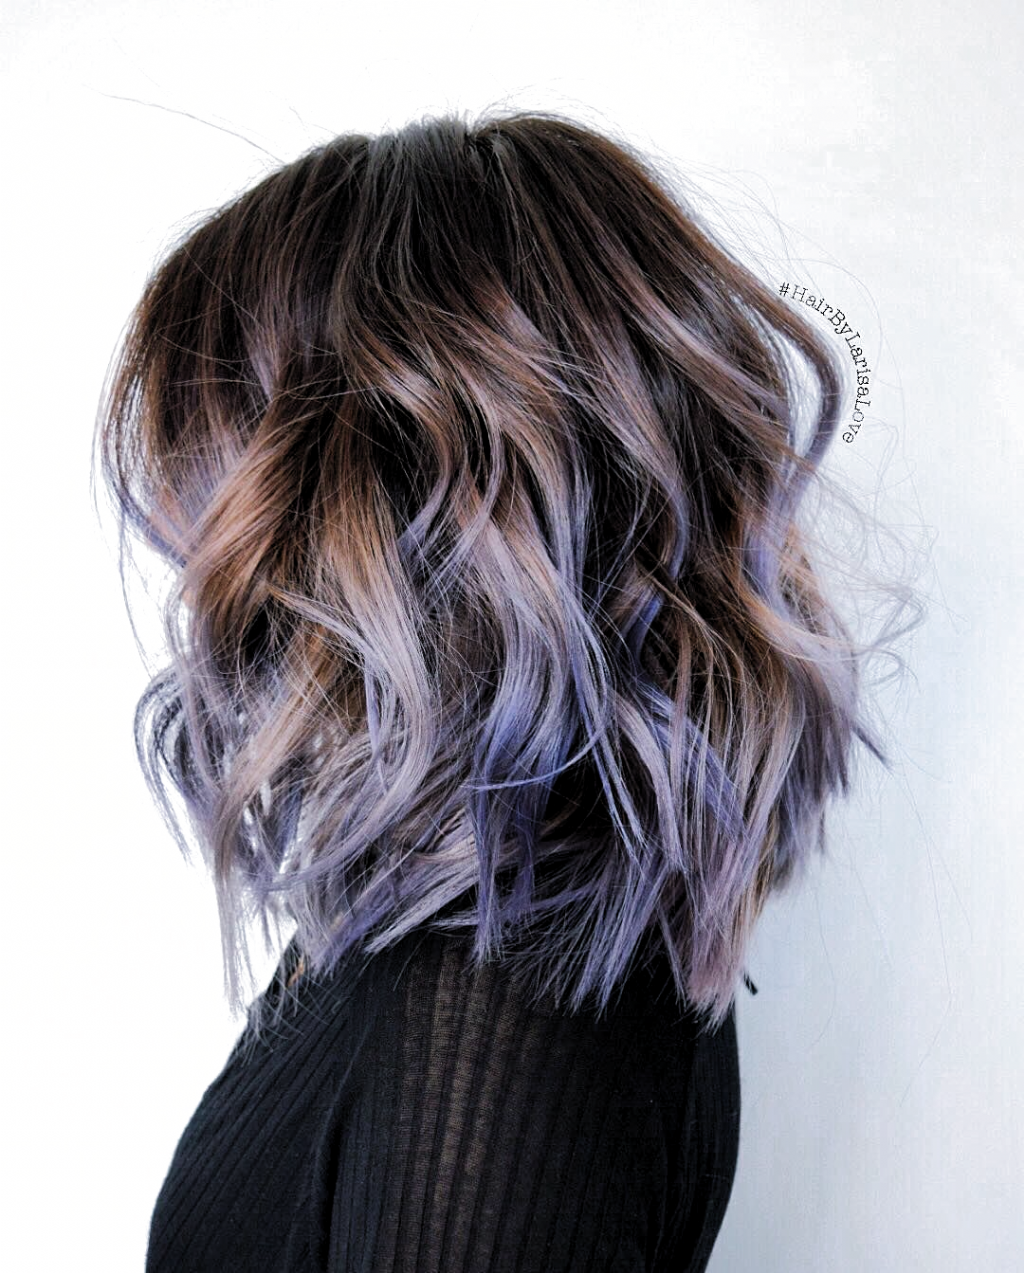 25 Brief Haircuts And Colors Short Hair Hair Color Dark Hair Styles Hair Highlights